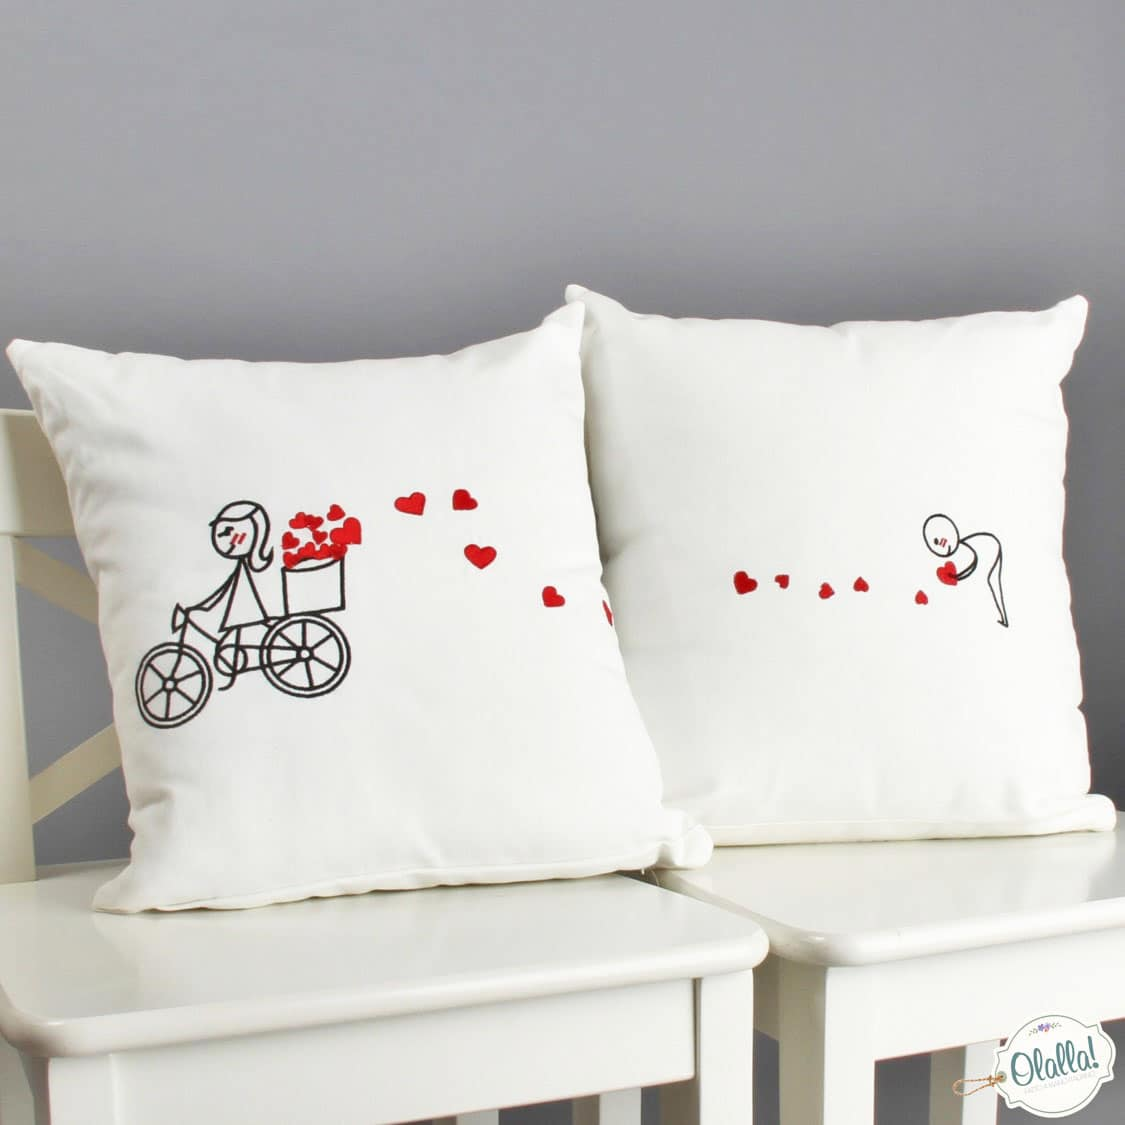 coppia-cuscini-cuori.bicicletta-lui-lei-7